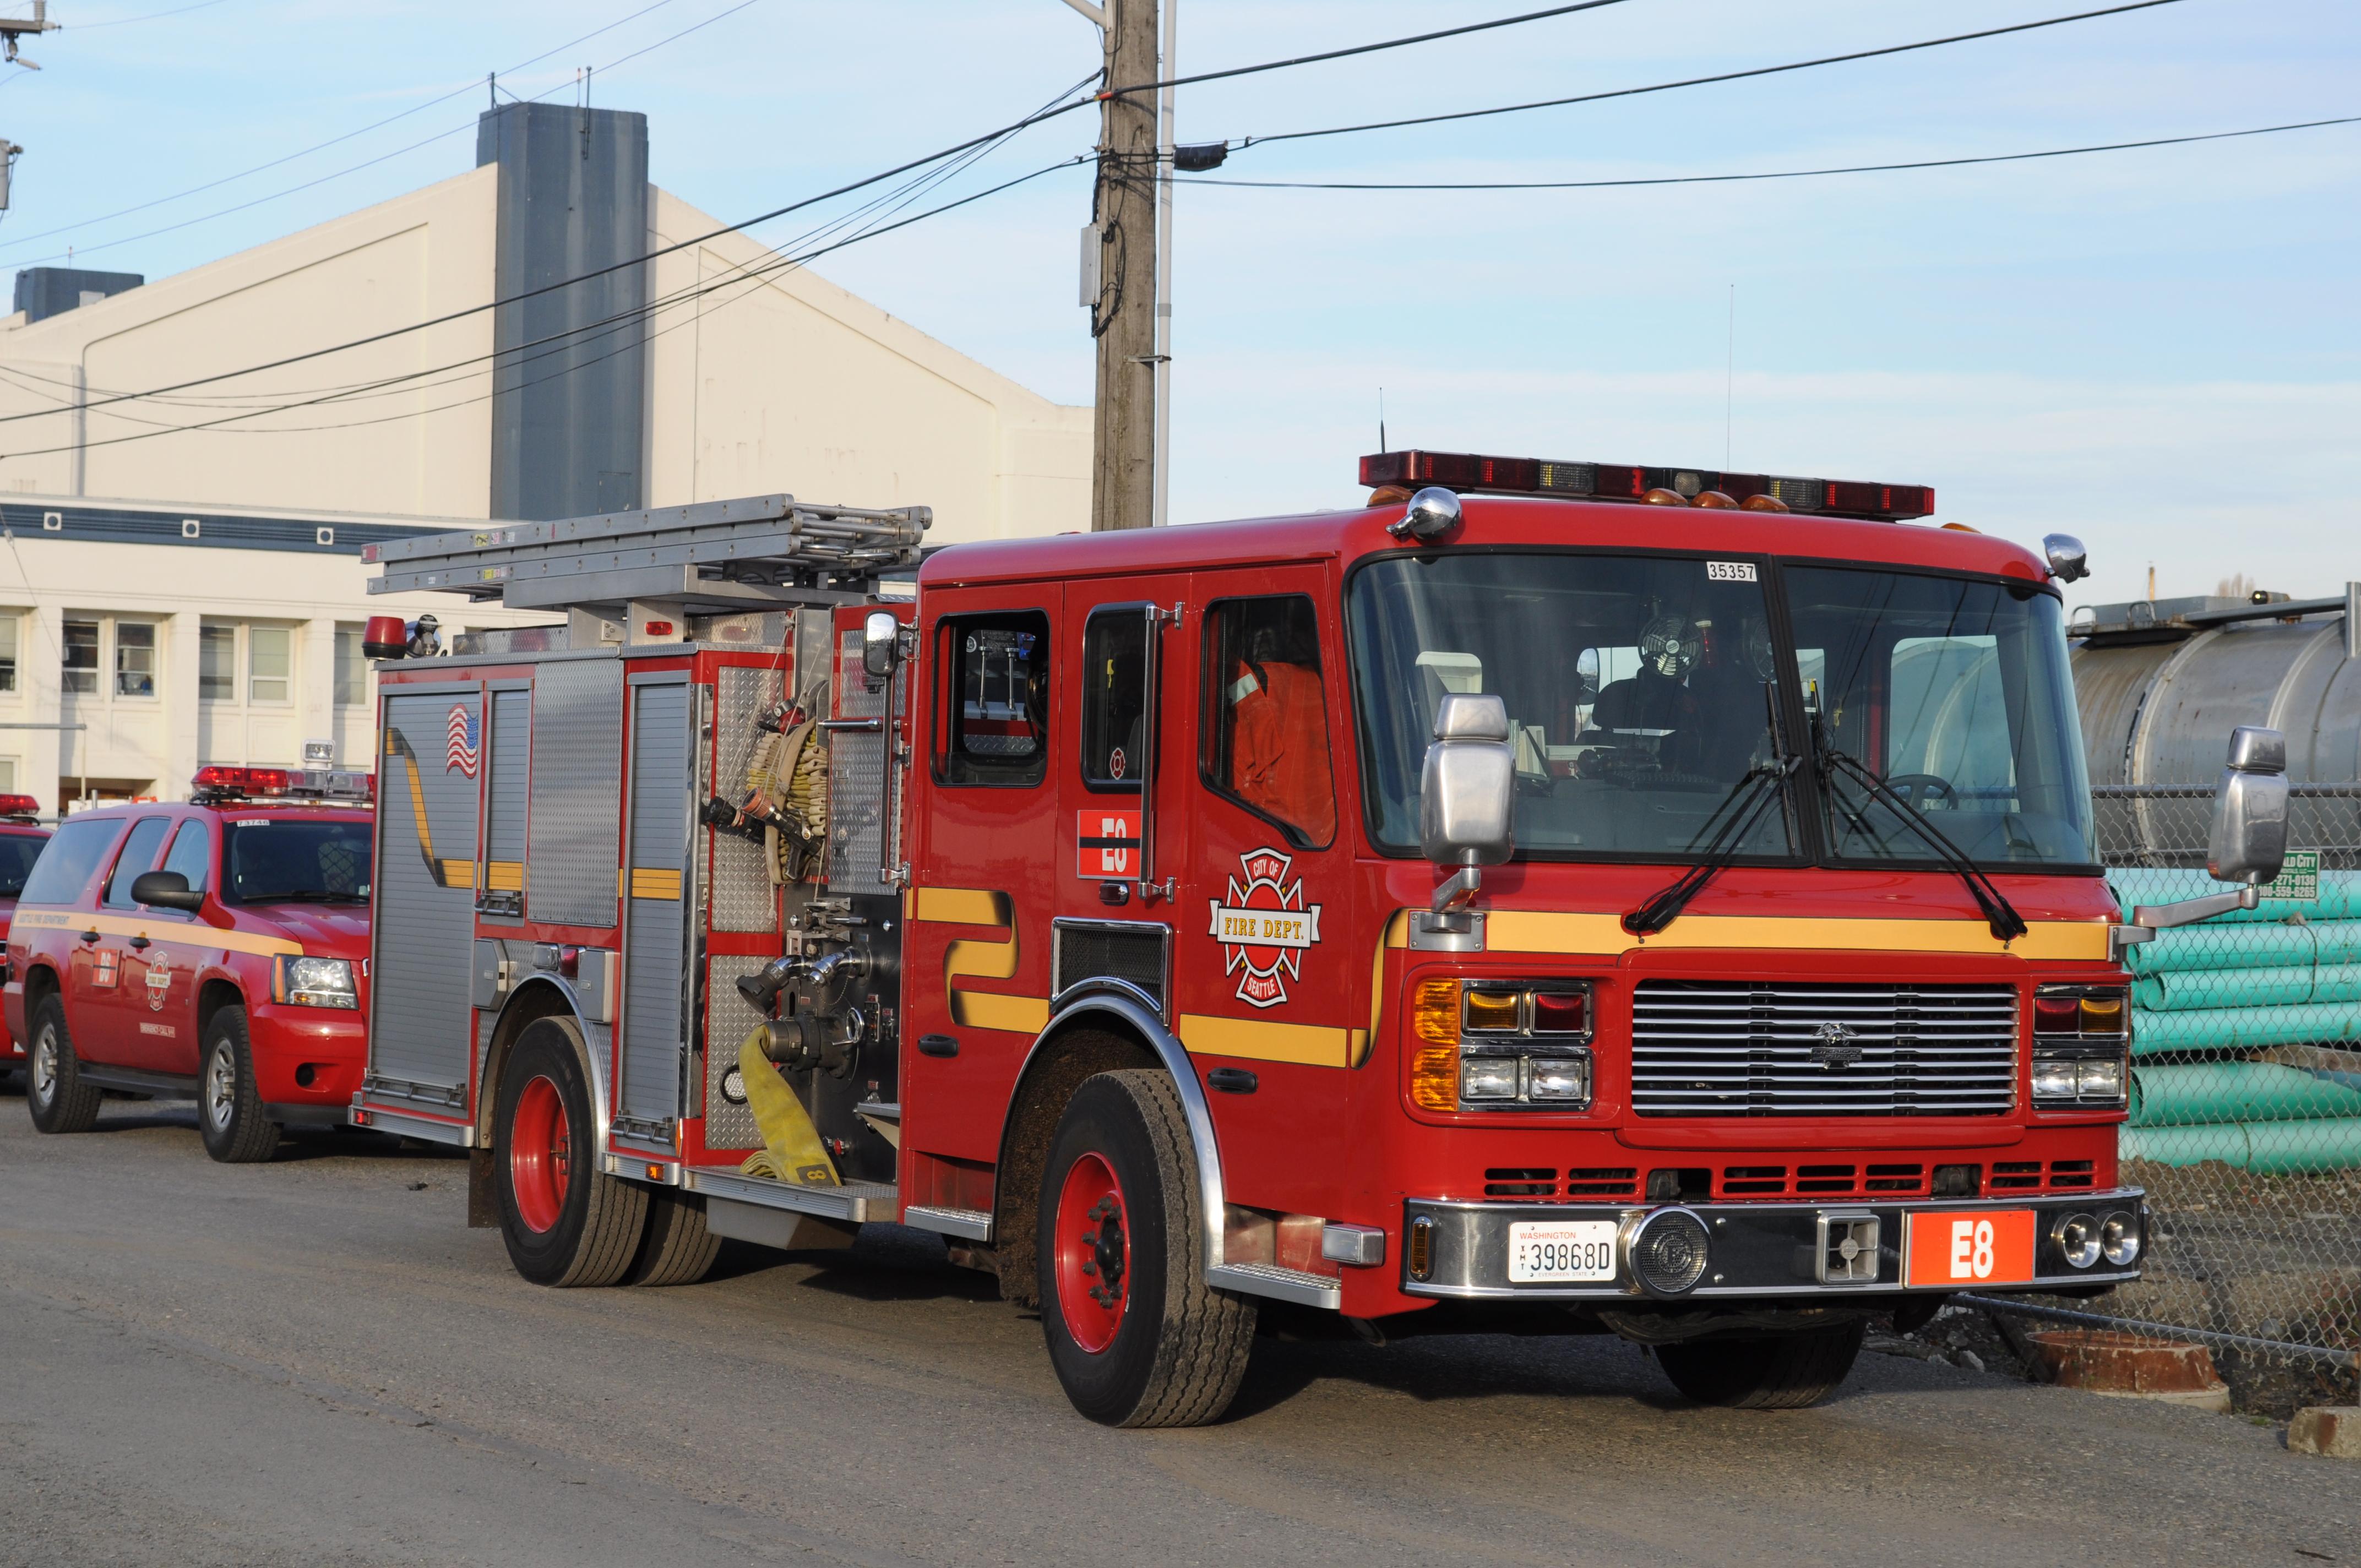 File:Seattle Fire Department - Engine 8 jpg - Wikimedia Commons